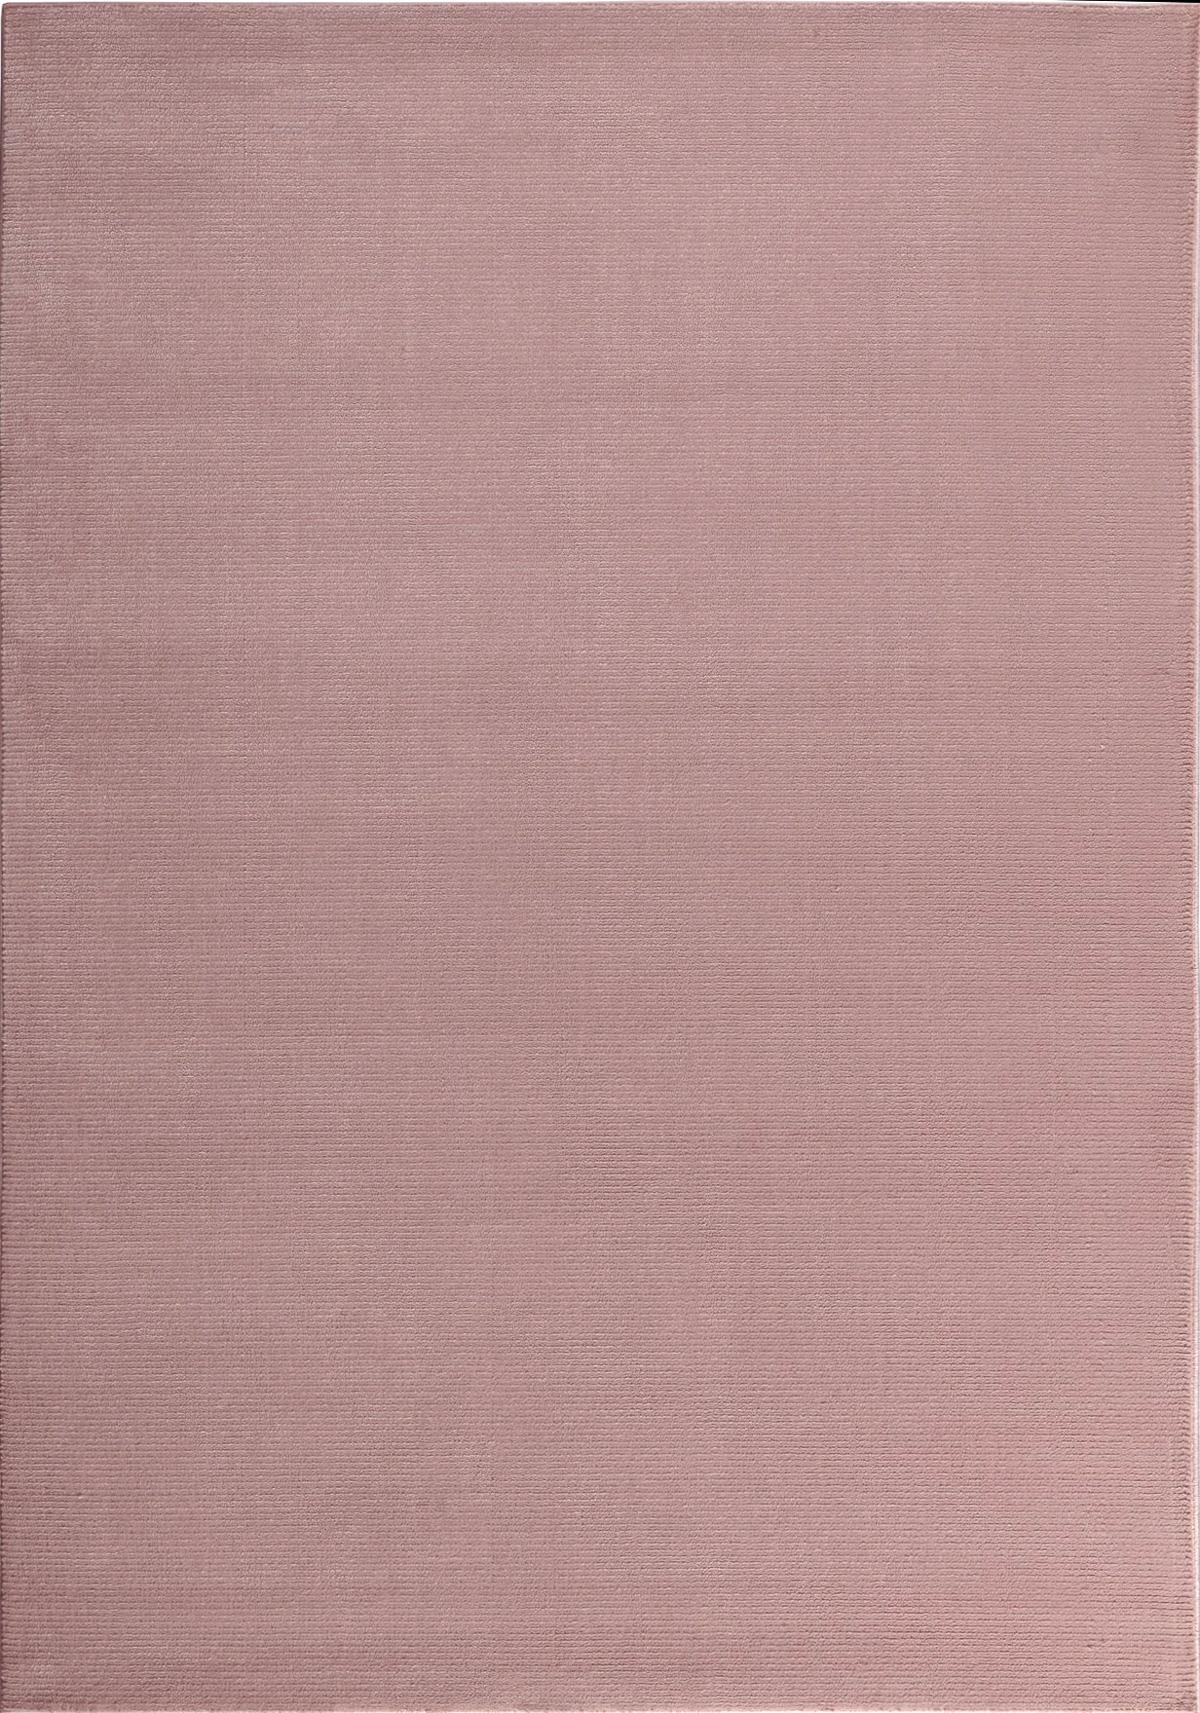 Tapis moderne uni doux rose 200x290